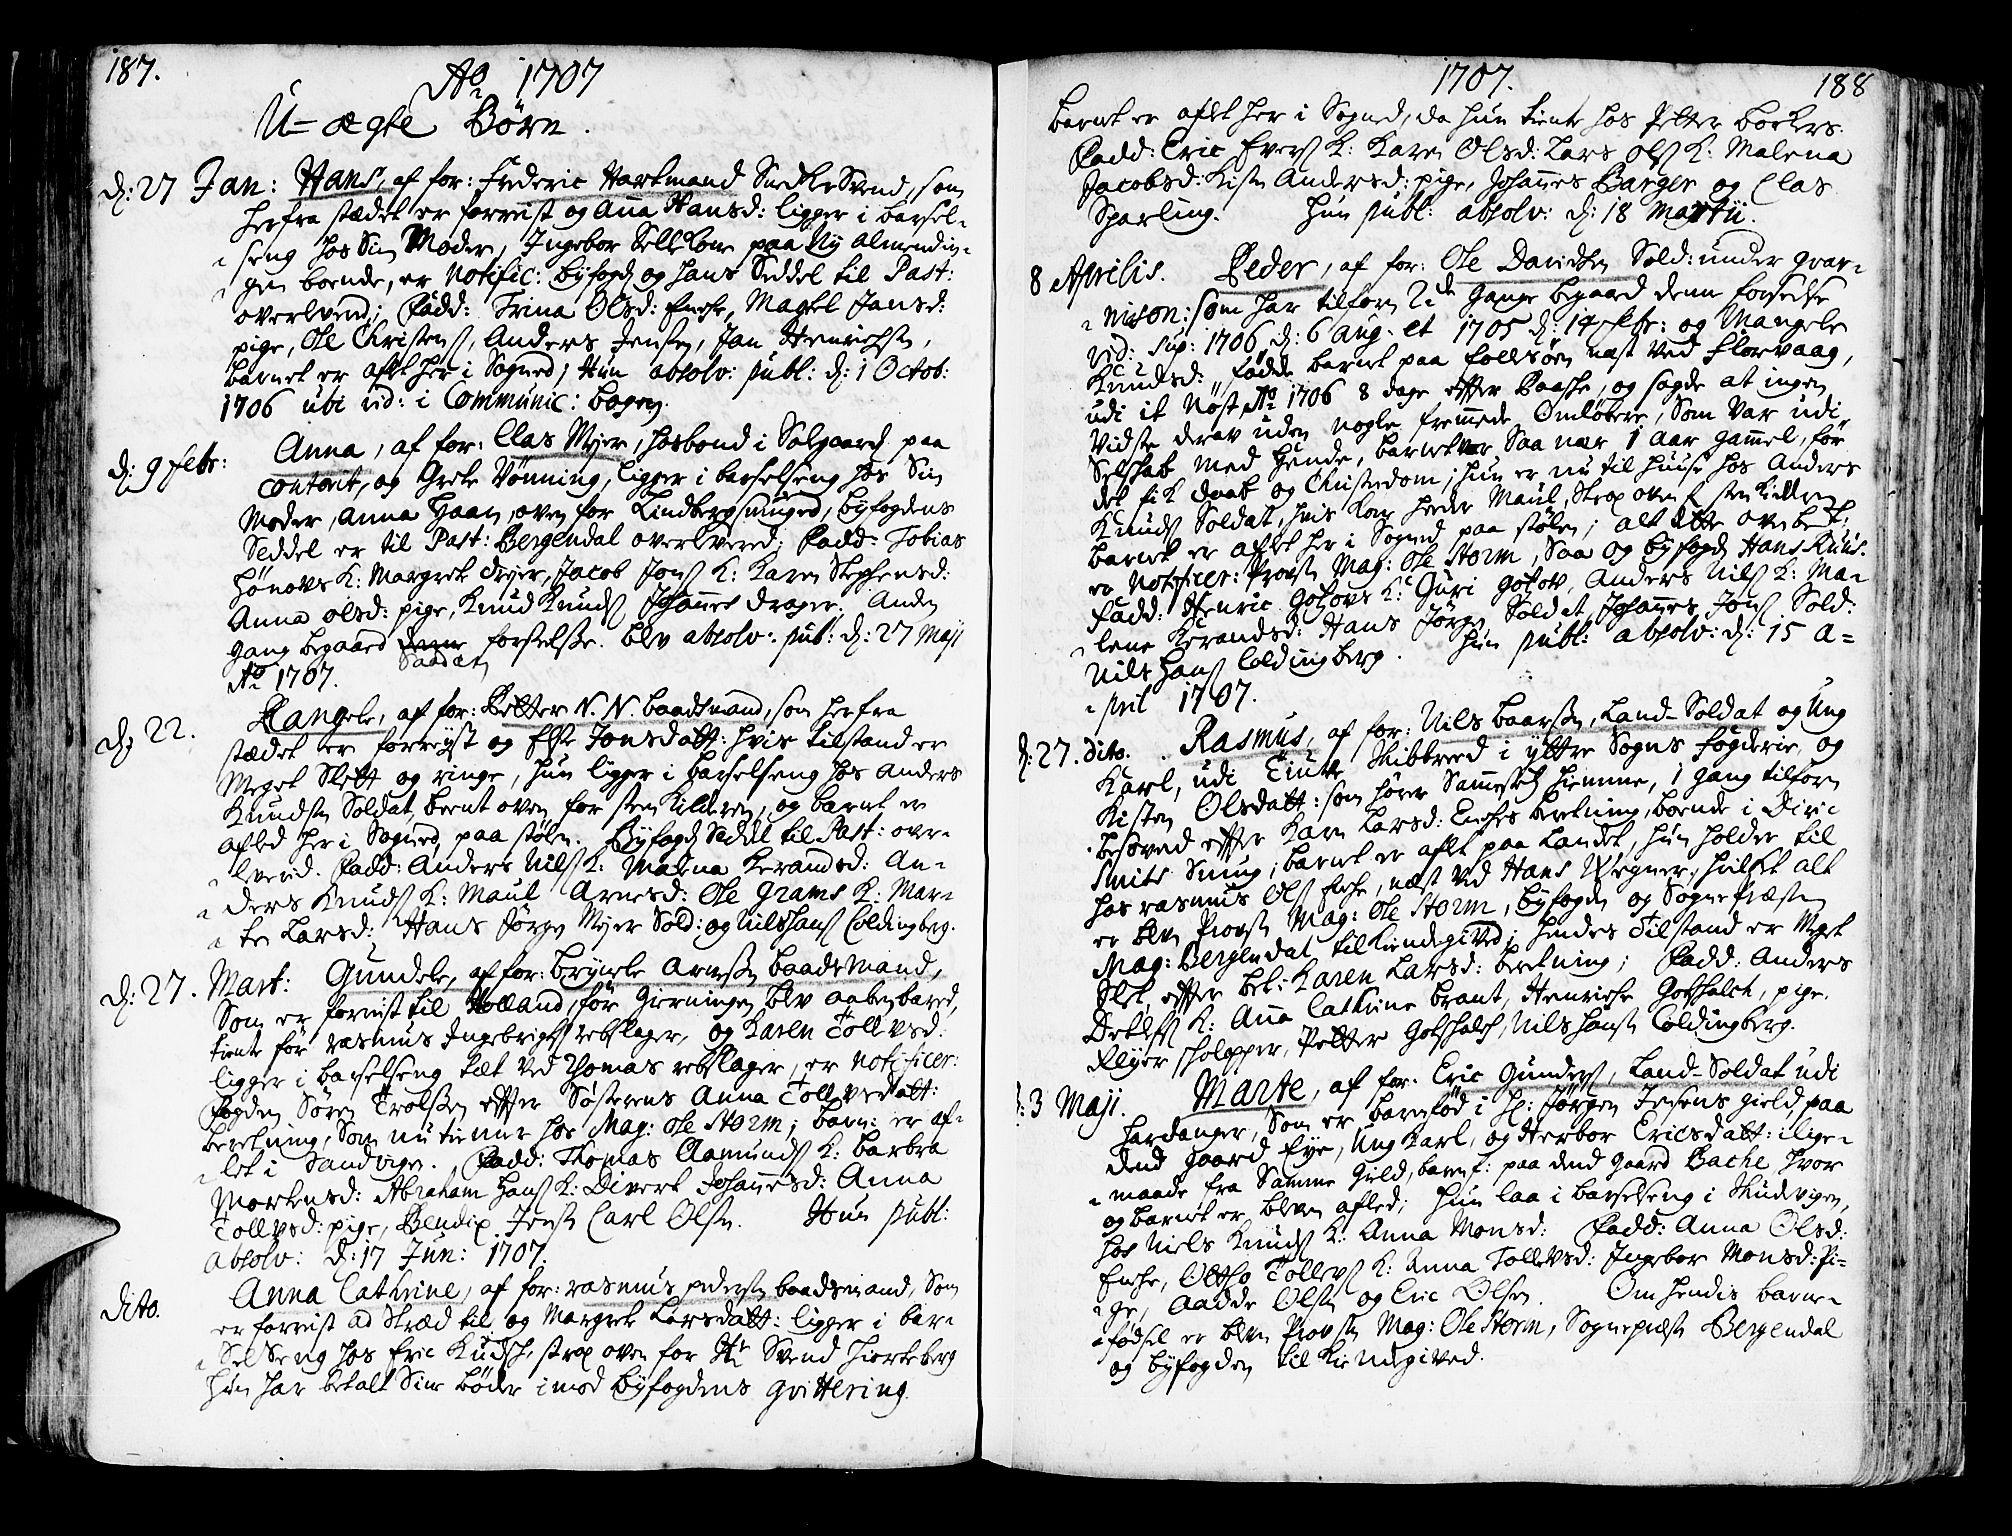 SAB, Korskirken Sokneprestembete, H/Haa/L0003: Ministerialbok nr. A 3, 1698-1719, s. 187-188